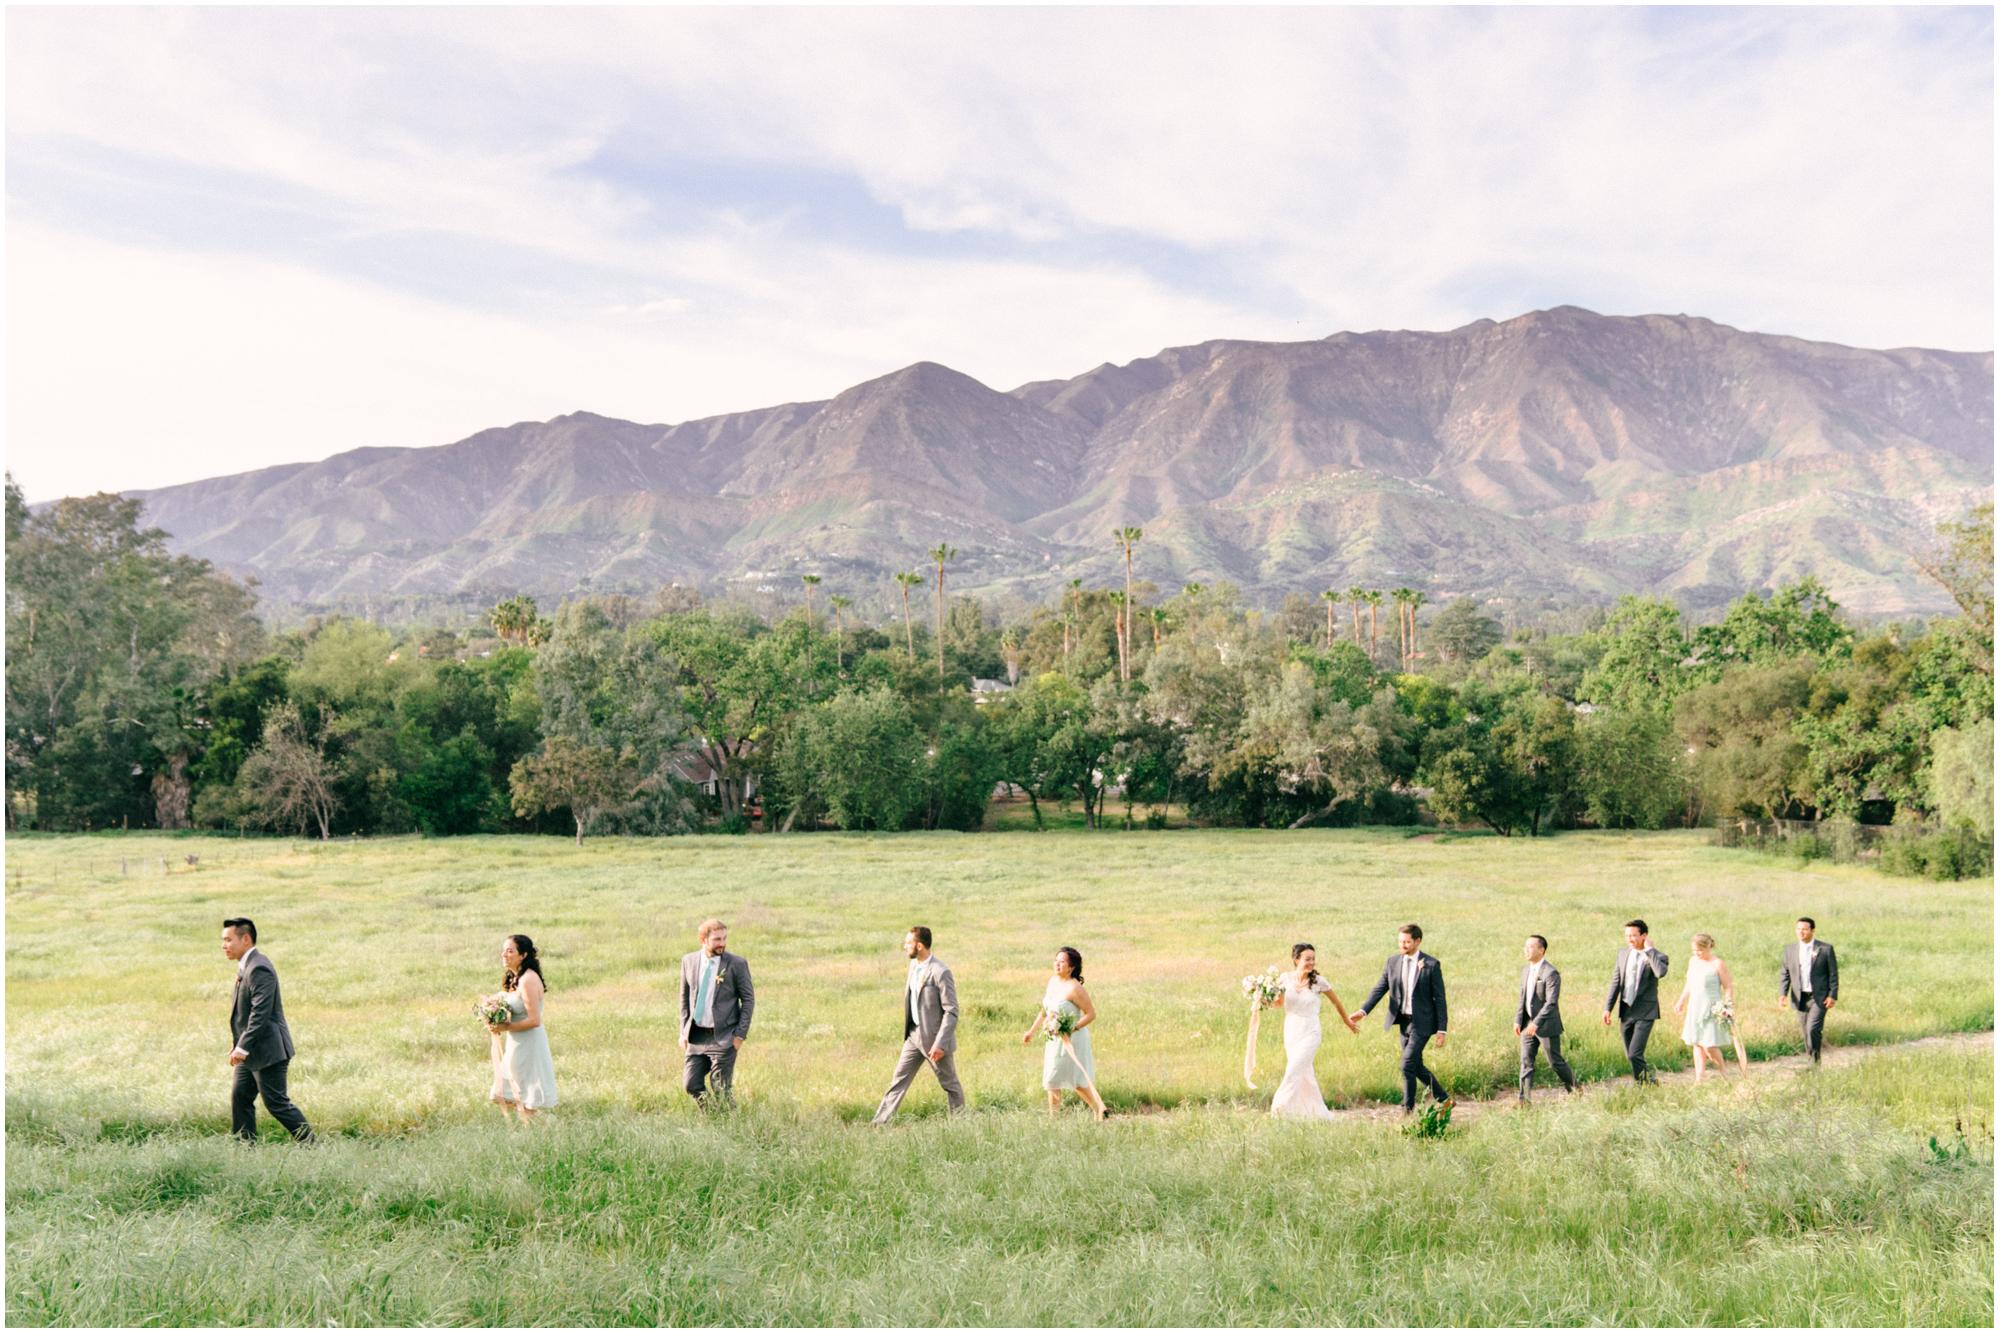 Los_Angeles_Wedding_Photographer_Ojai_Wedding_Pinnel_Photography-13.jpg